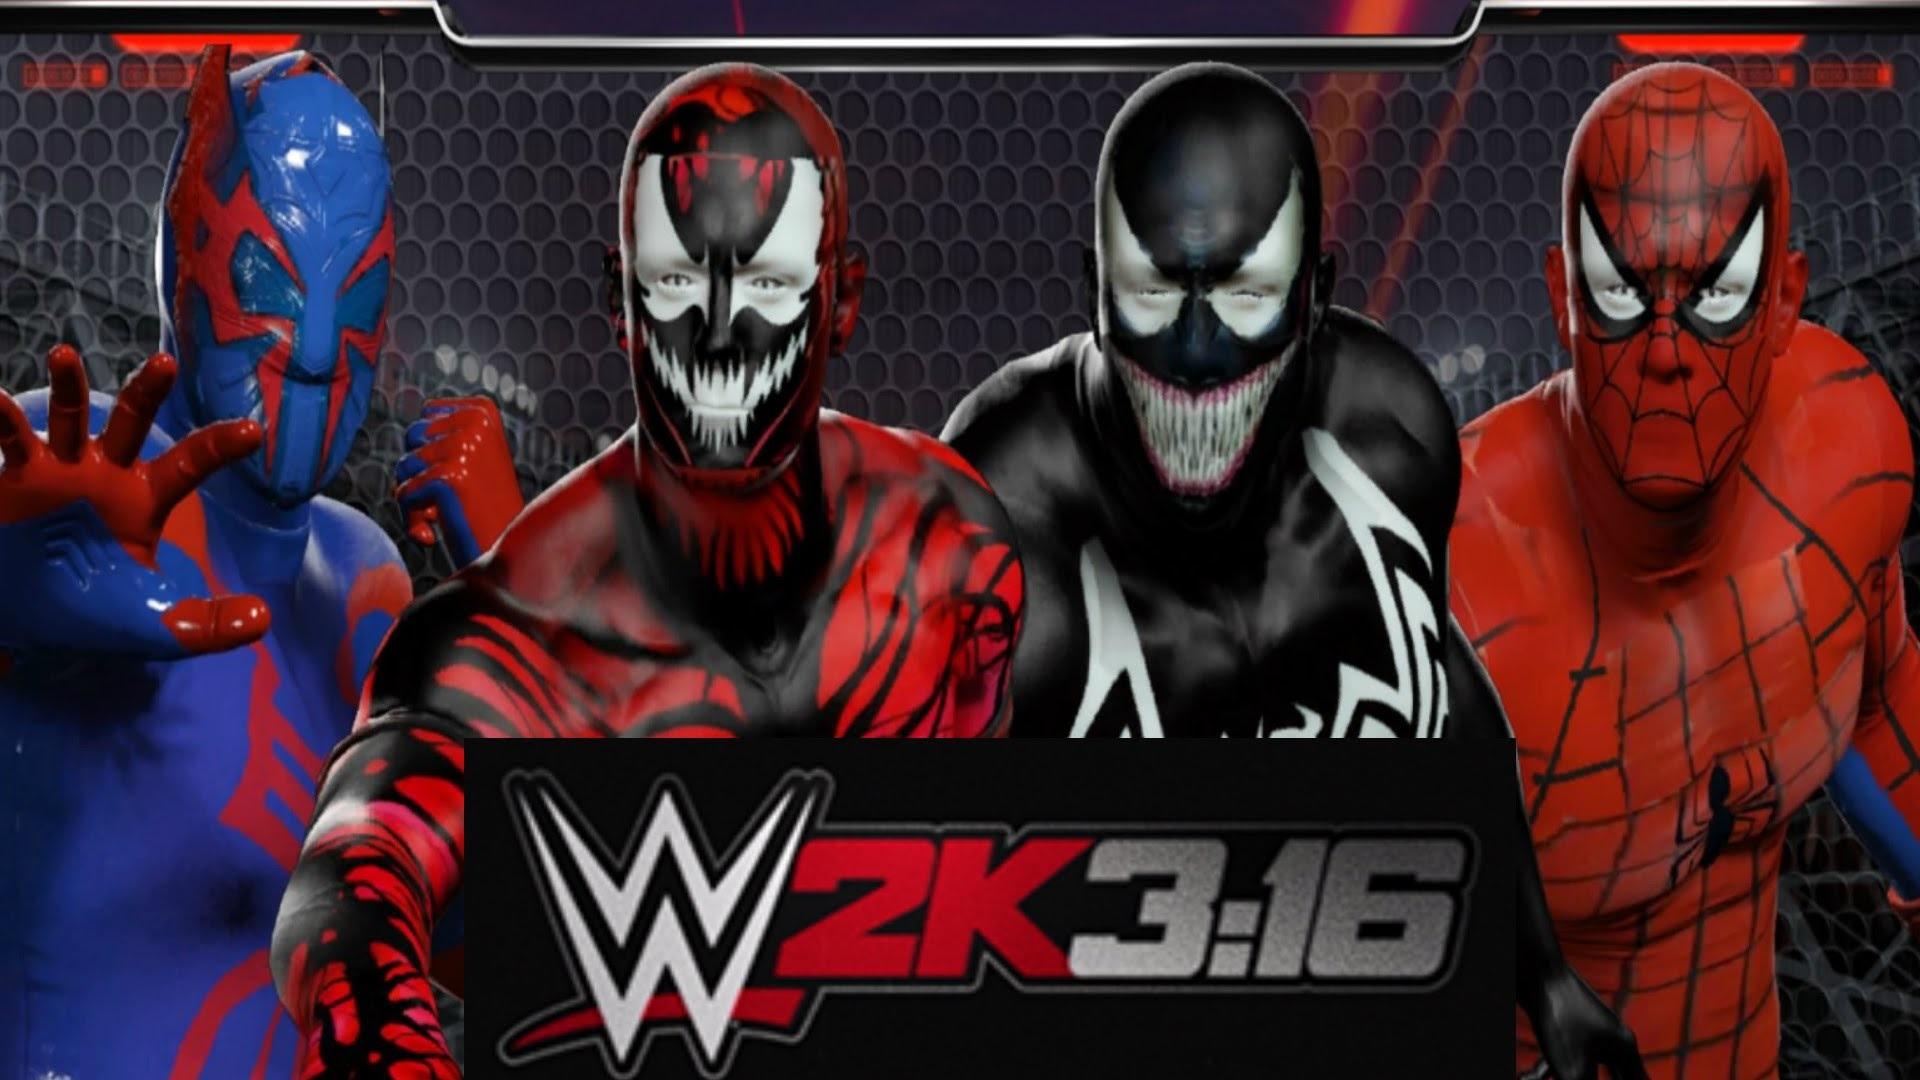 Spider Man 2099 HD Wallpaper (78+ images)